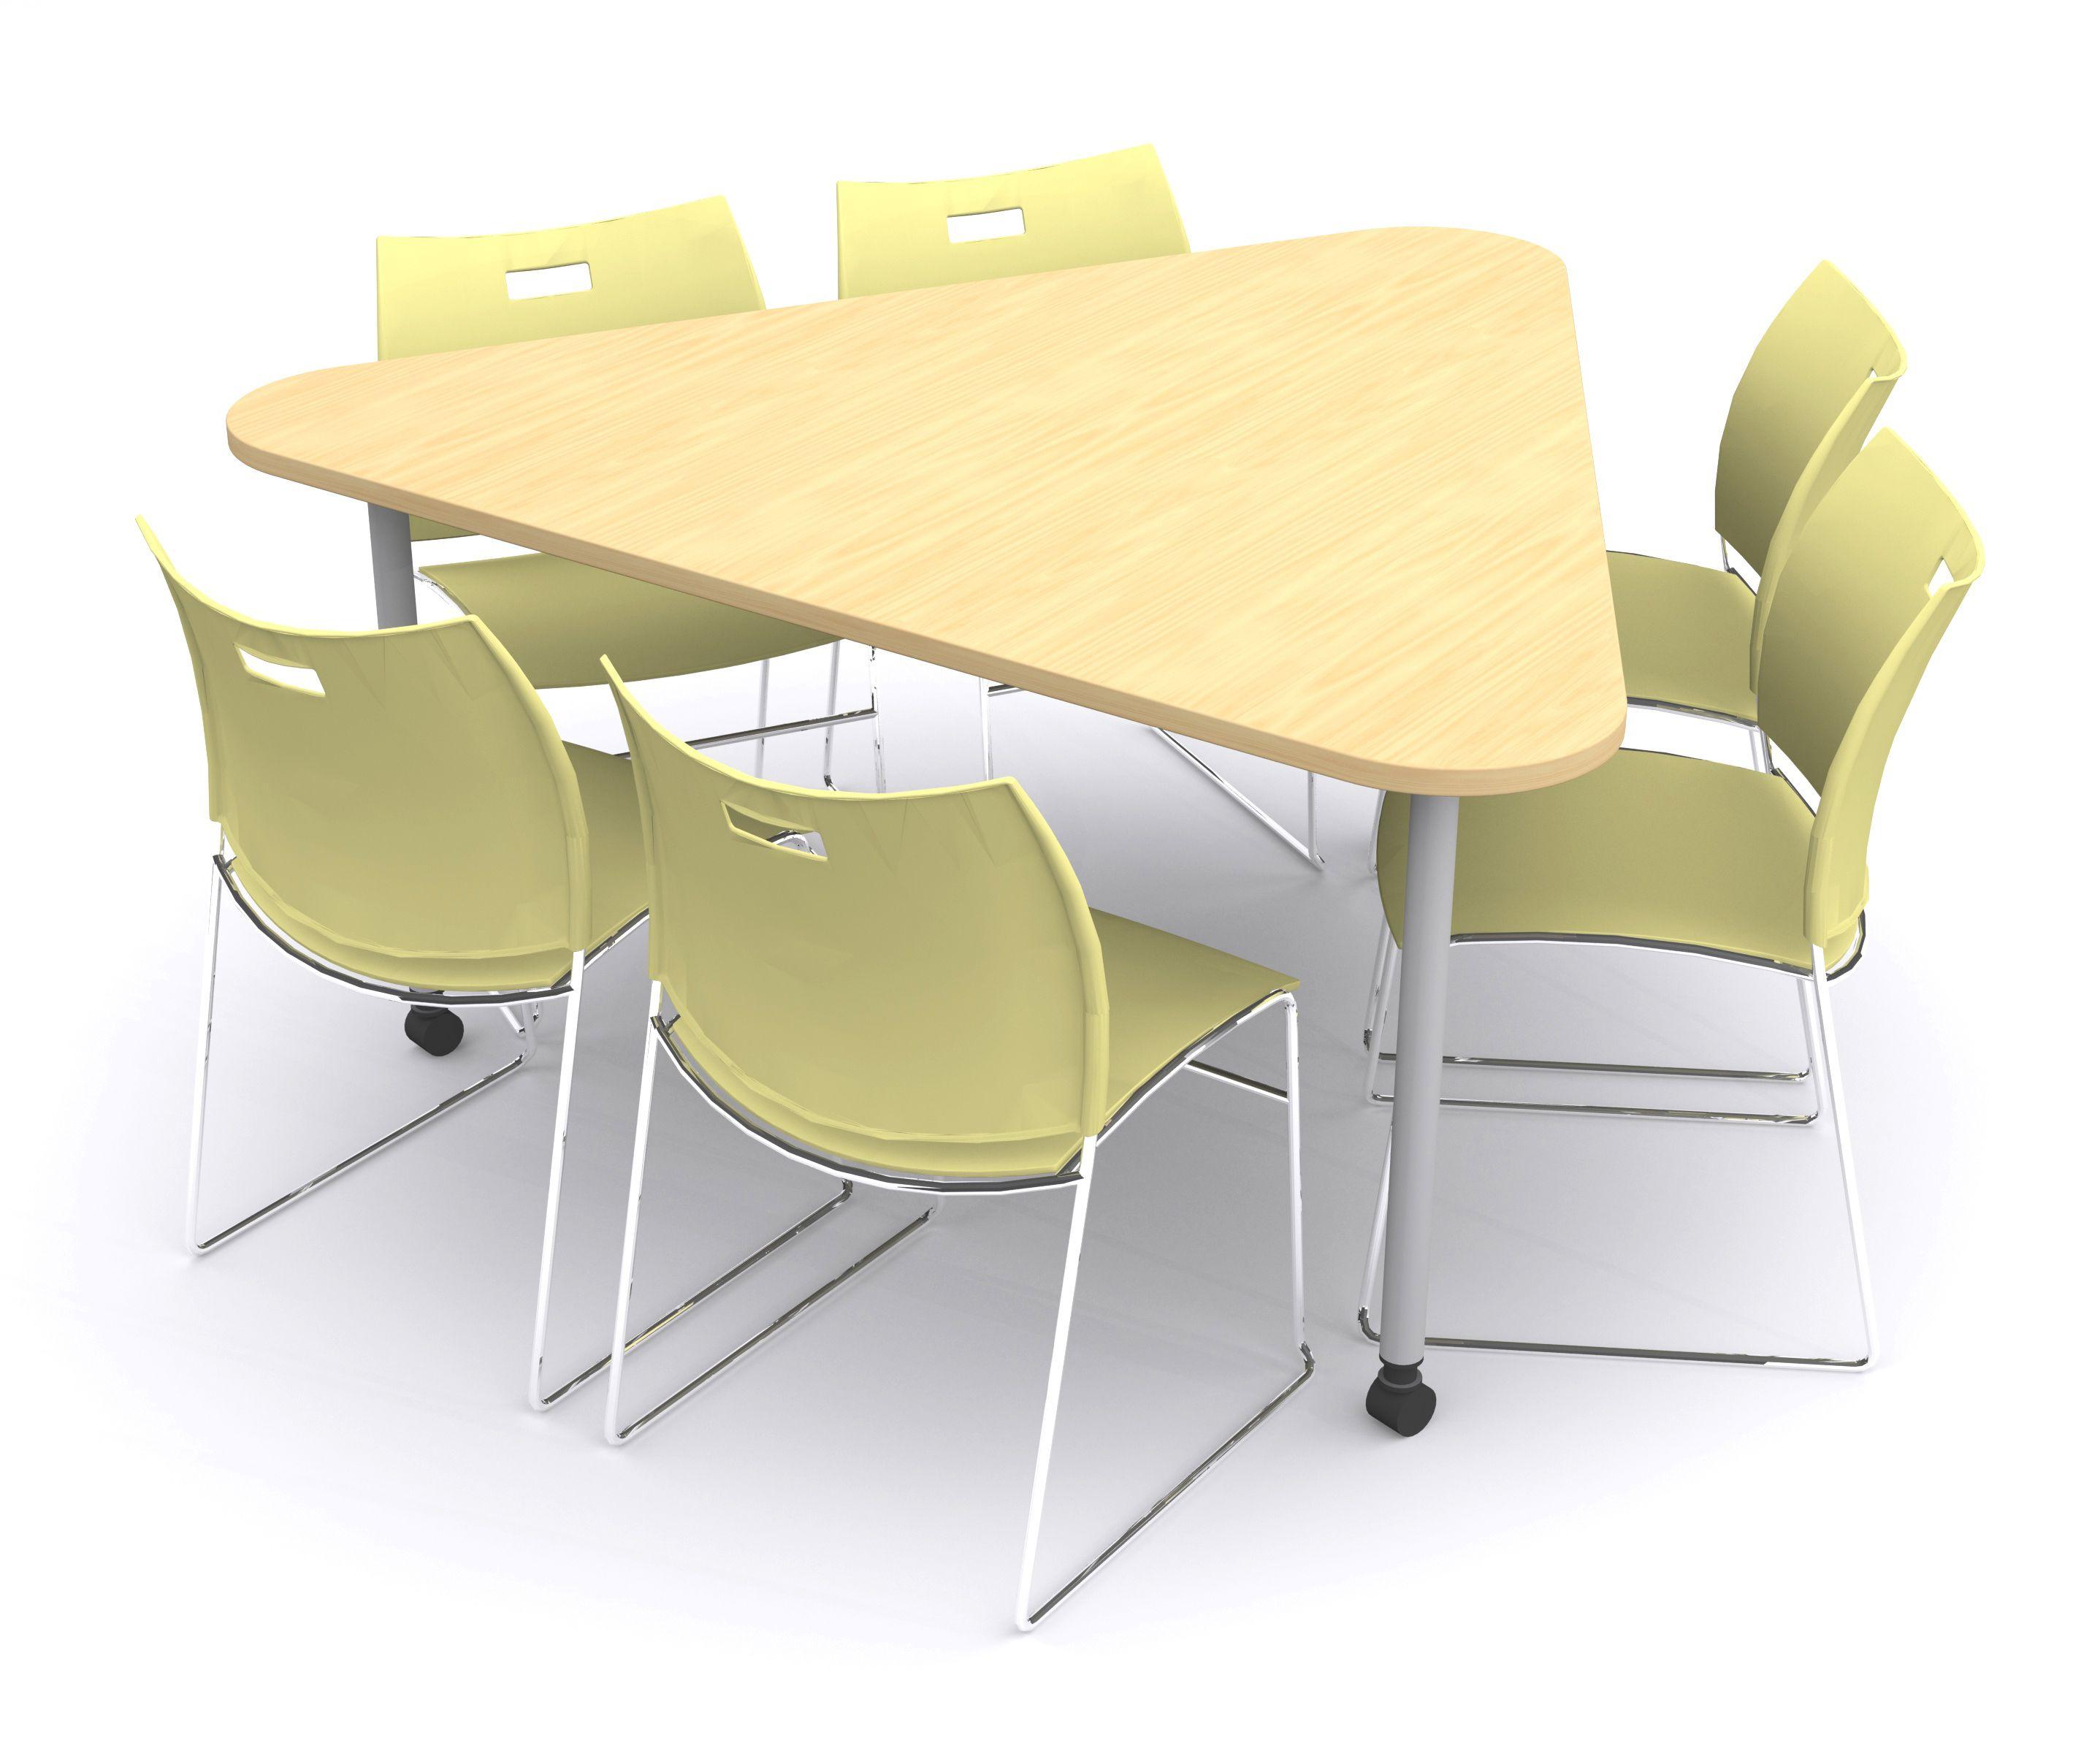 Plectrum Table Www Broadstock Co Uk Clroom Furniture